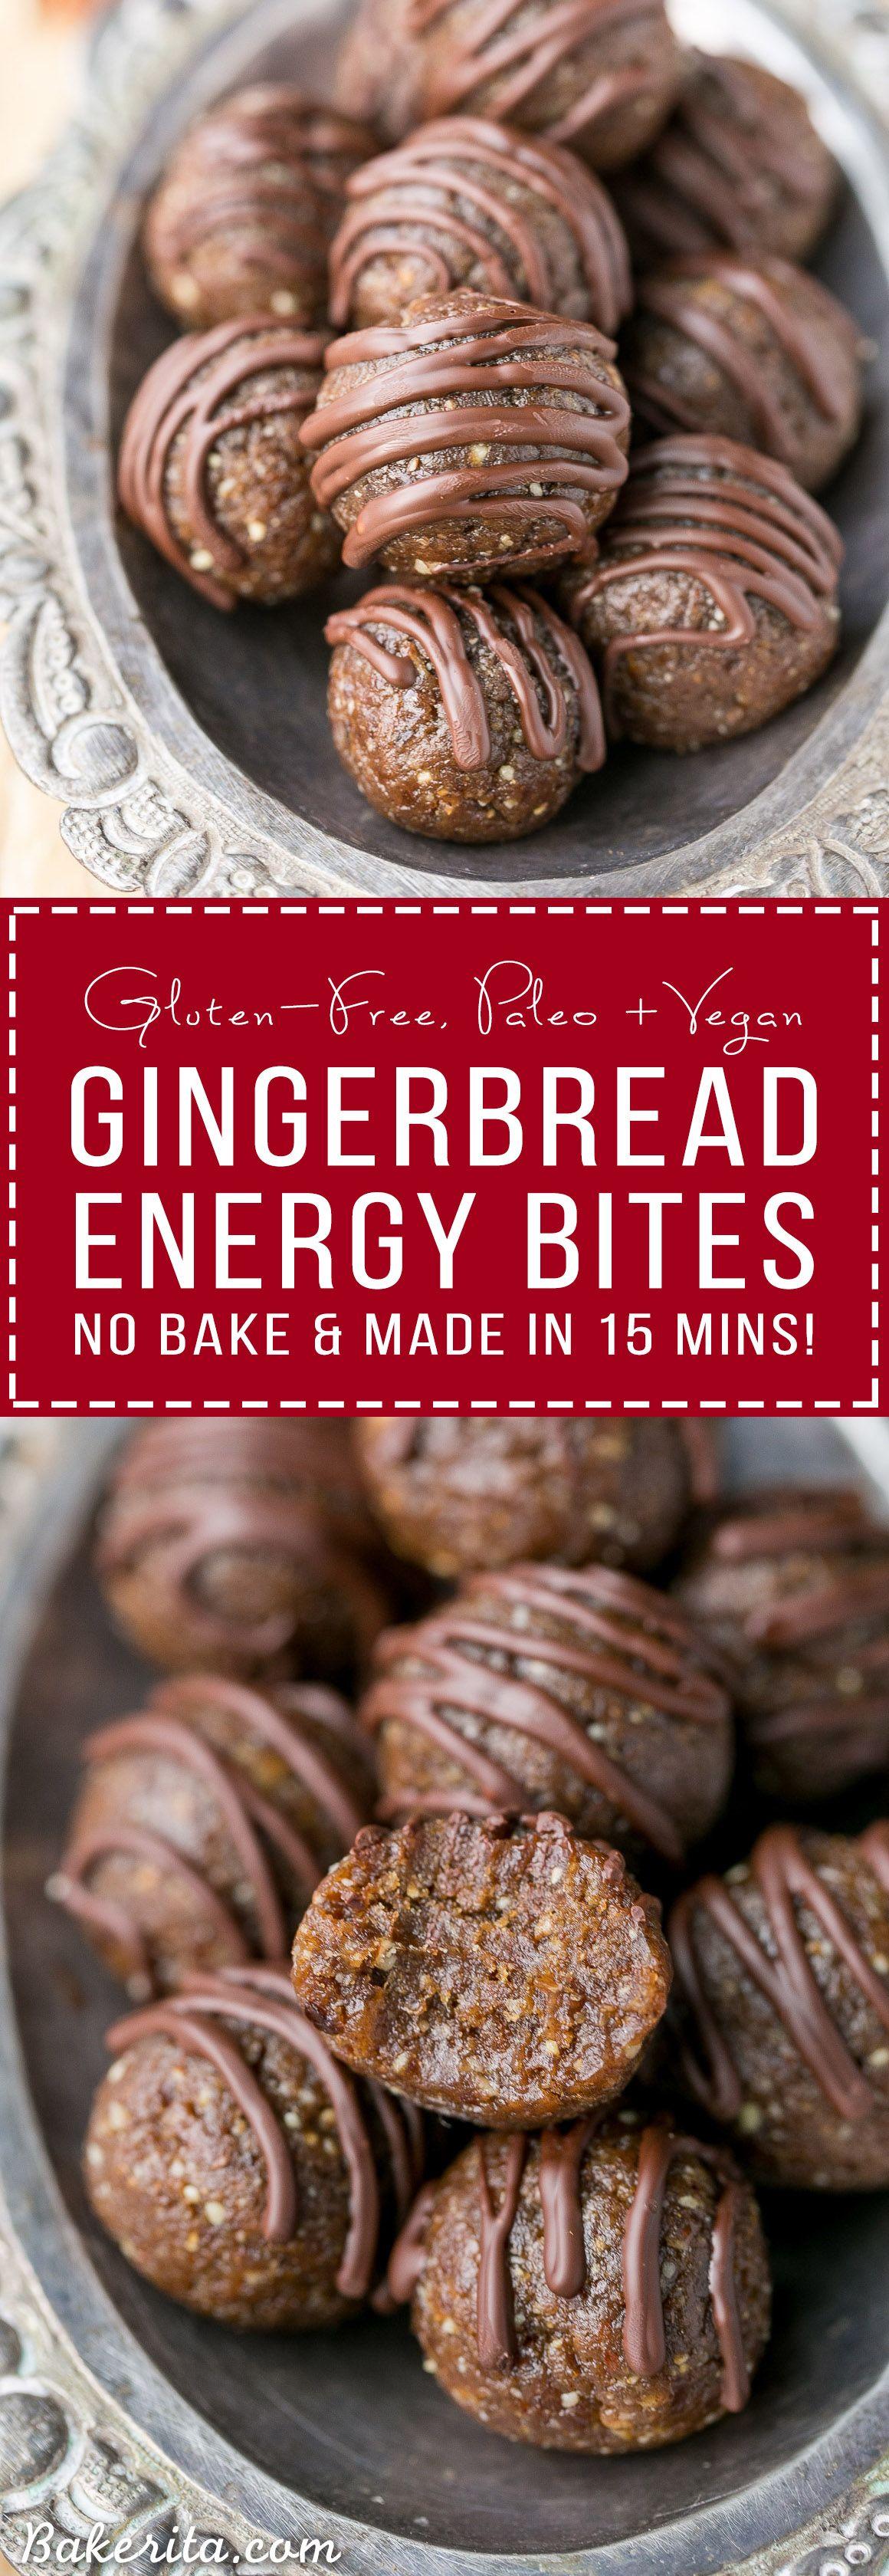 Gingerbread Energy Bites (No-Bake, Gluten Free, Paleo + Vegan)